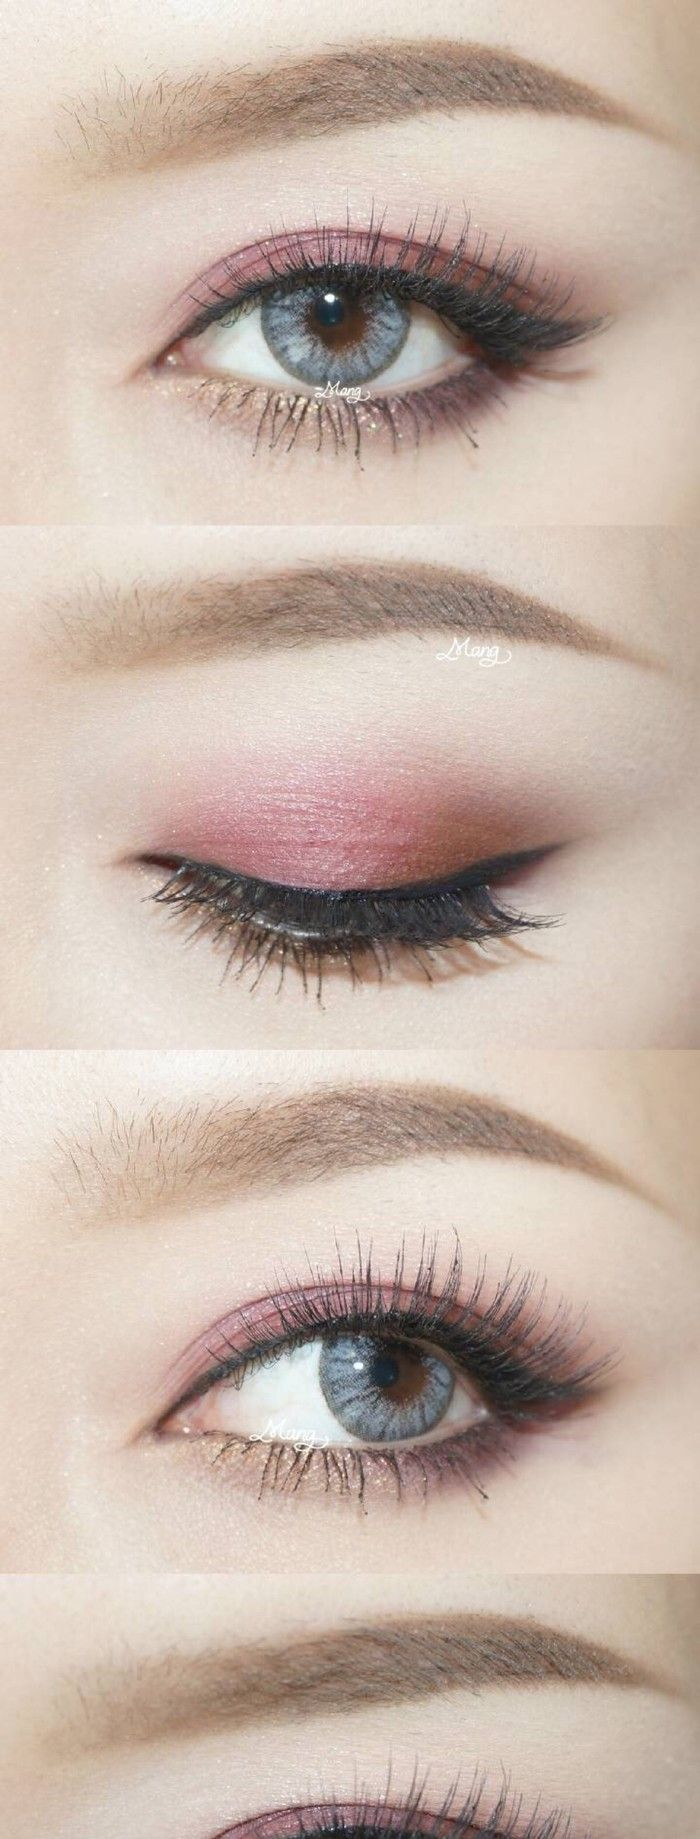 Korean Natural Eyebrow Tutorial By Liah Yoo